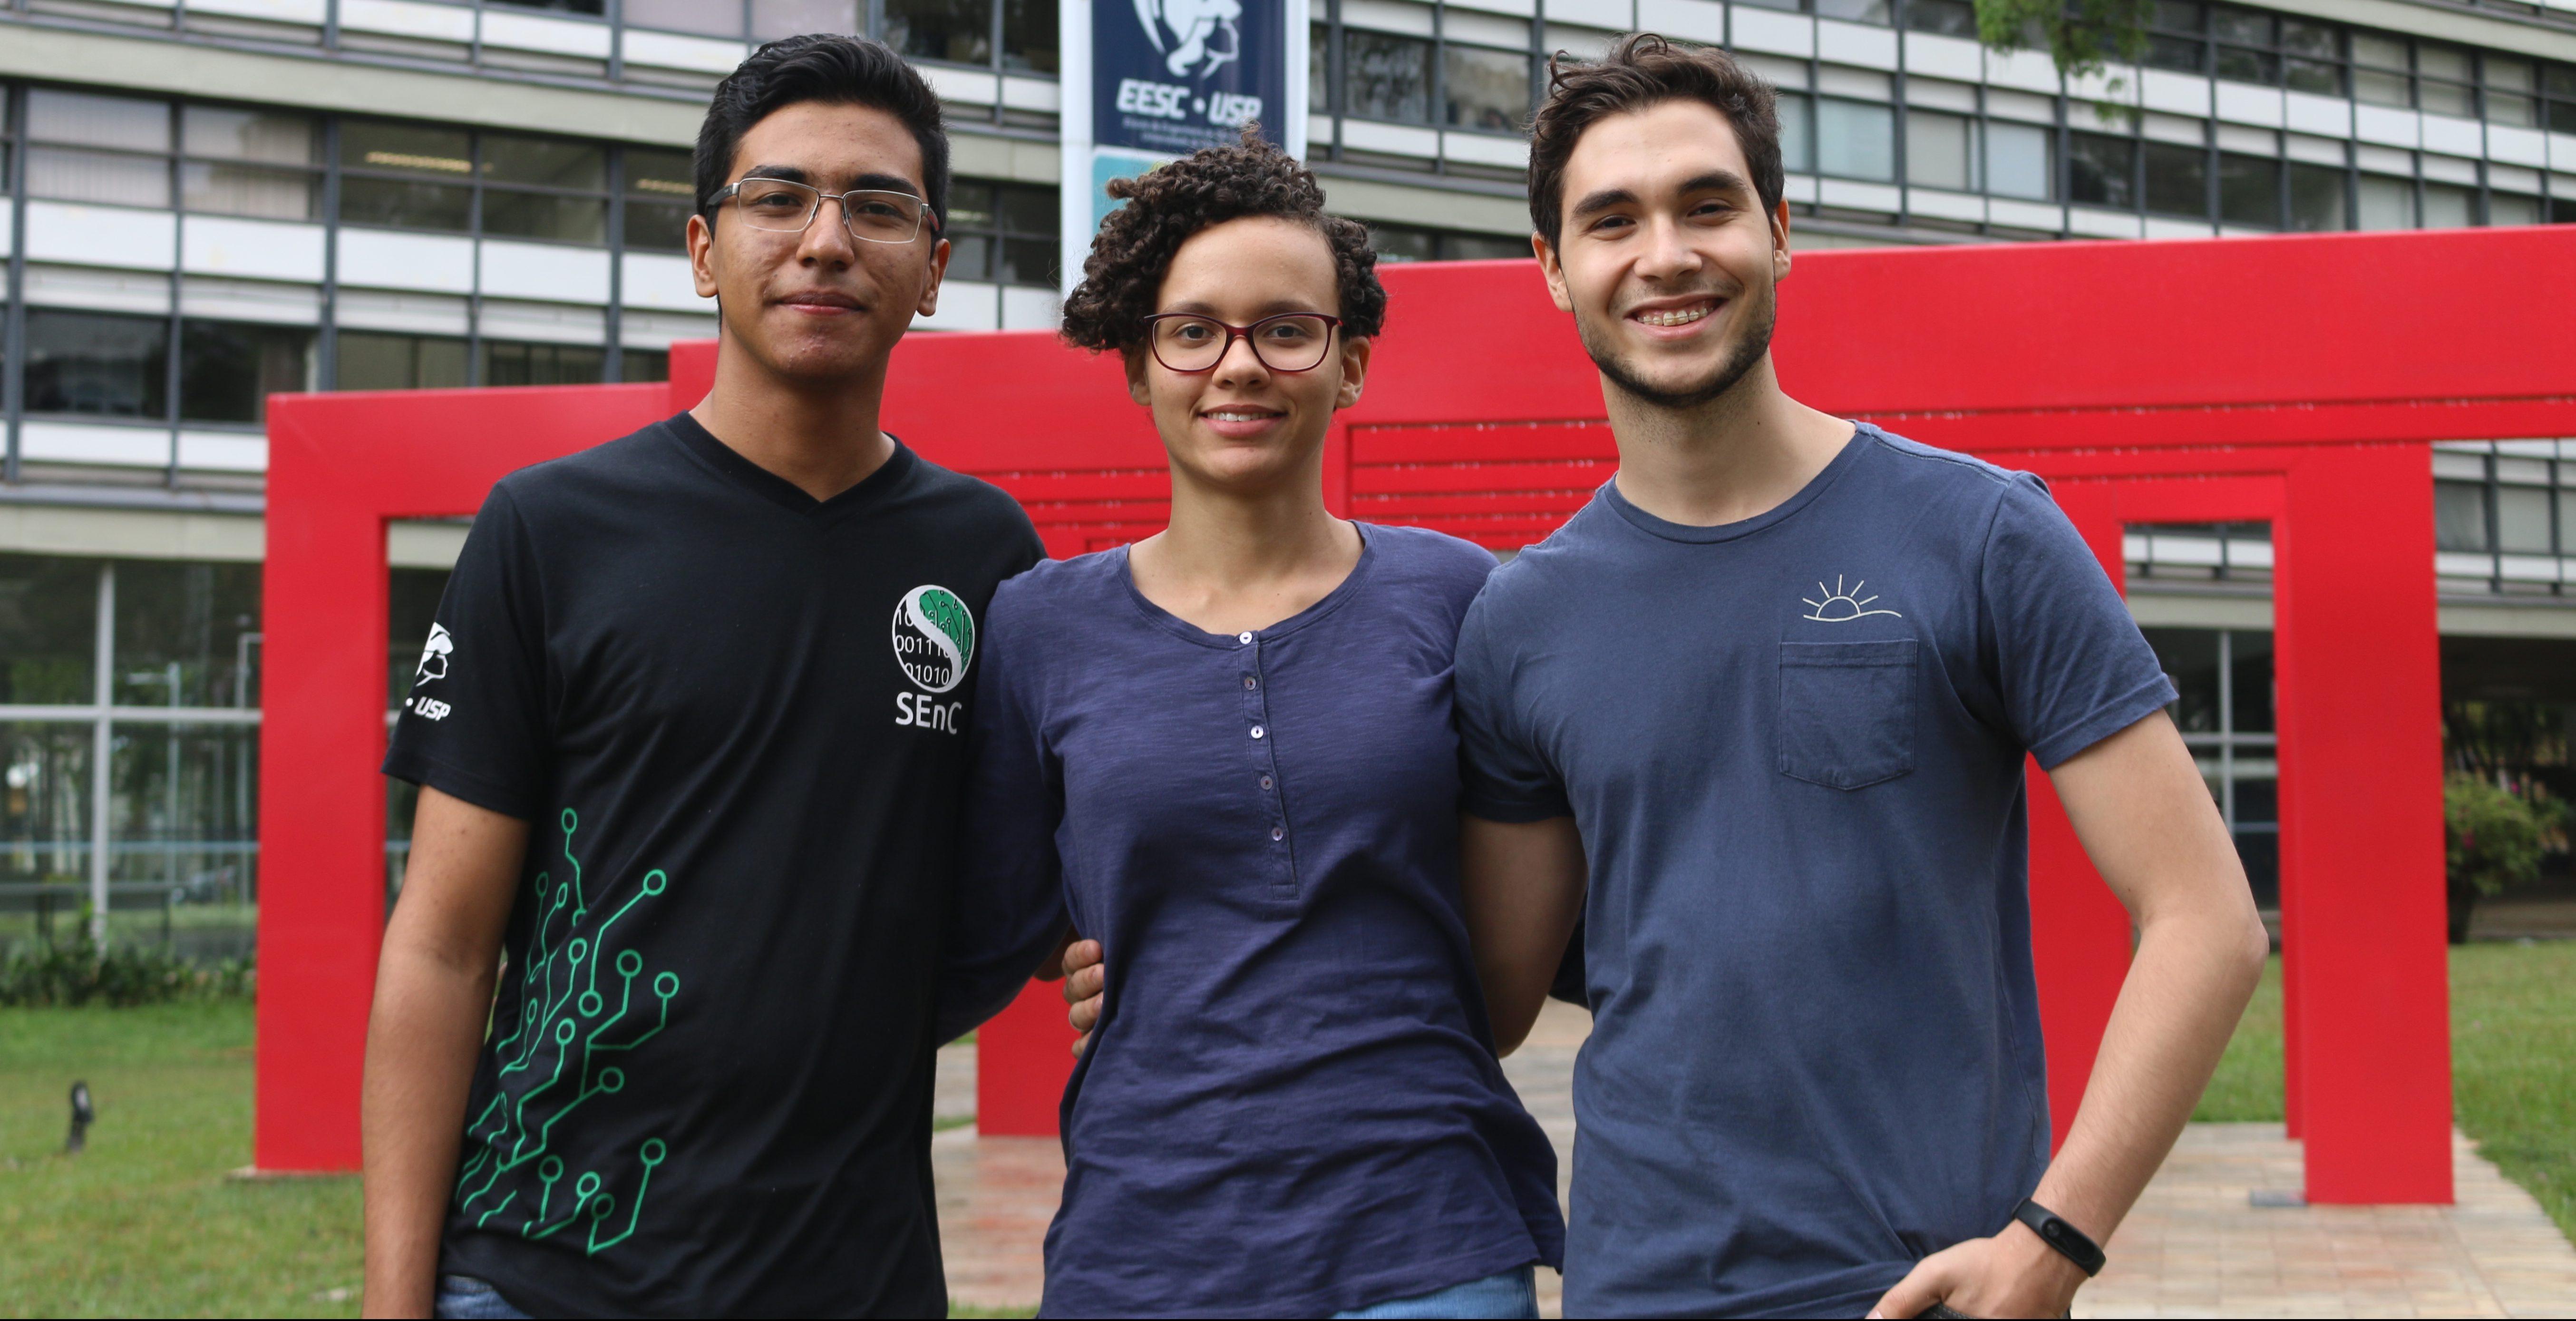 Alunos da USP participam de programa internacional para jovens líderes